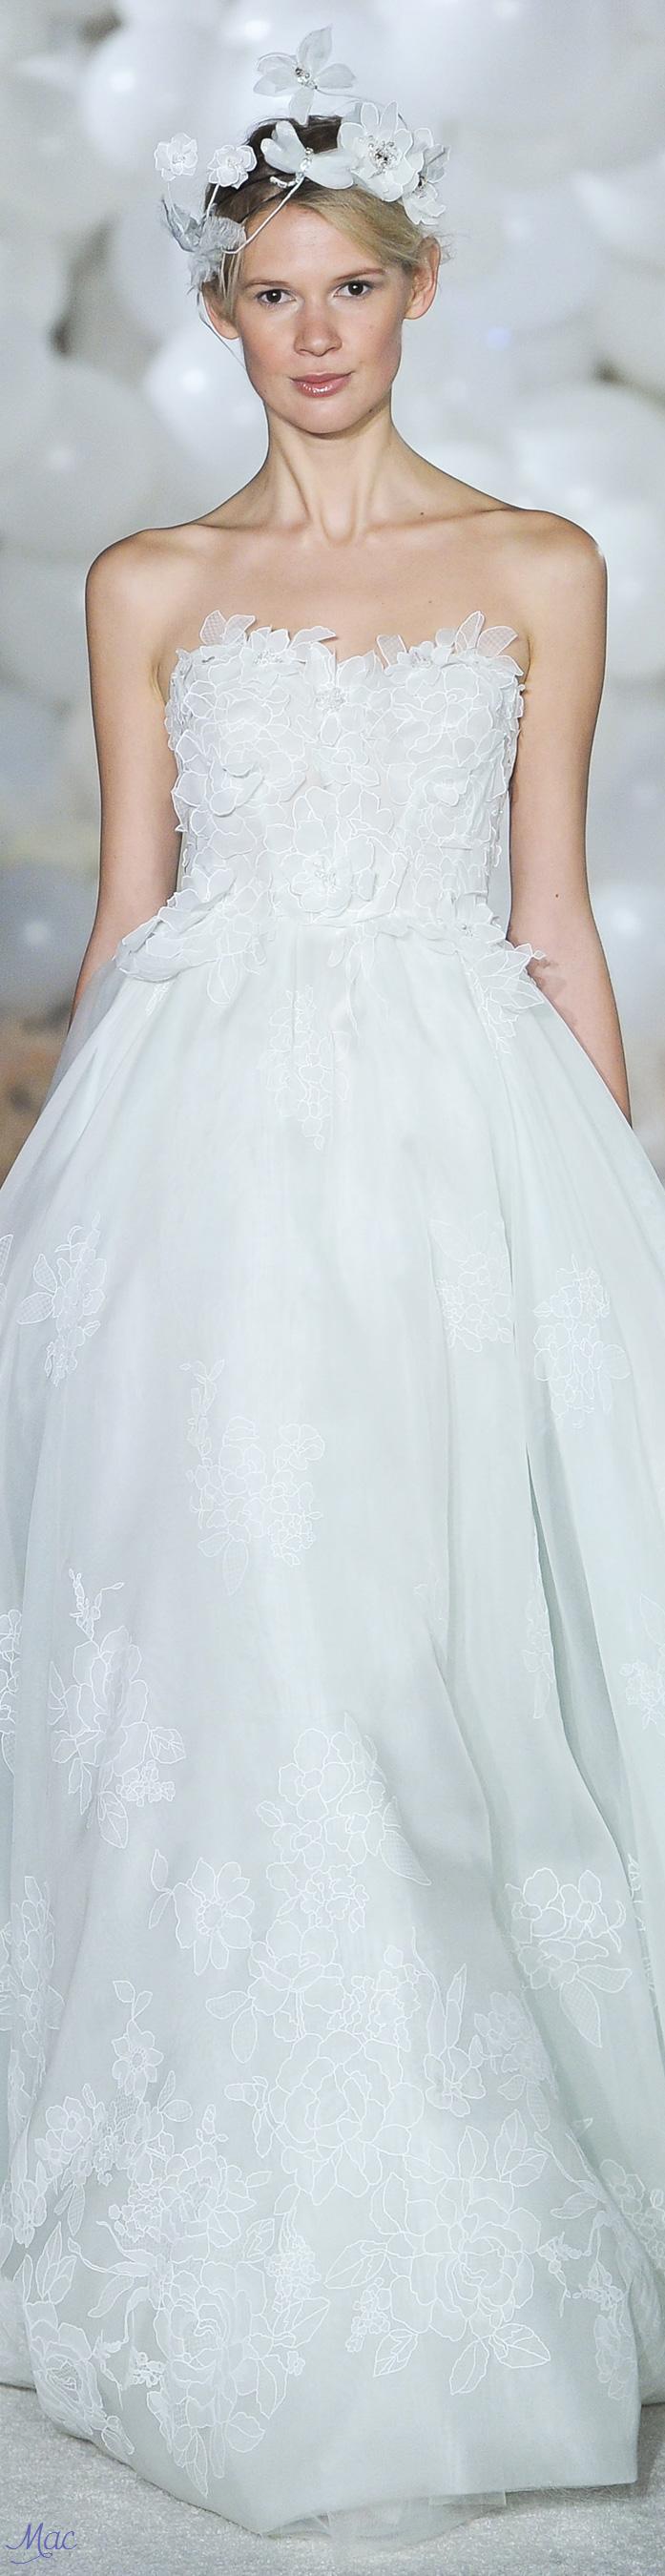 Spring bridal mira zwillinger wedding ideas pinterest